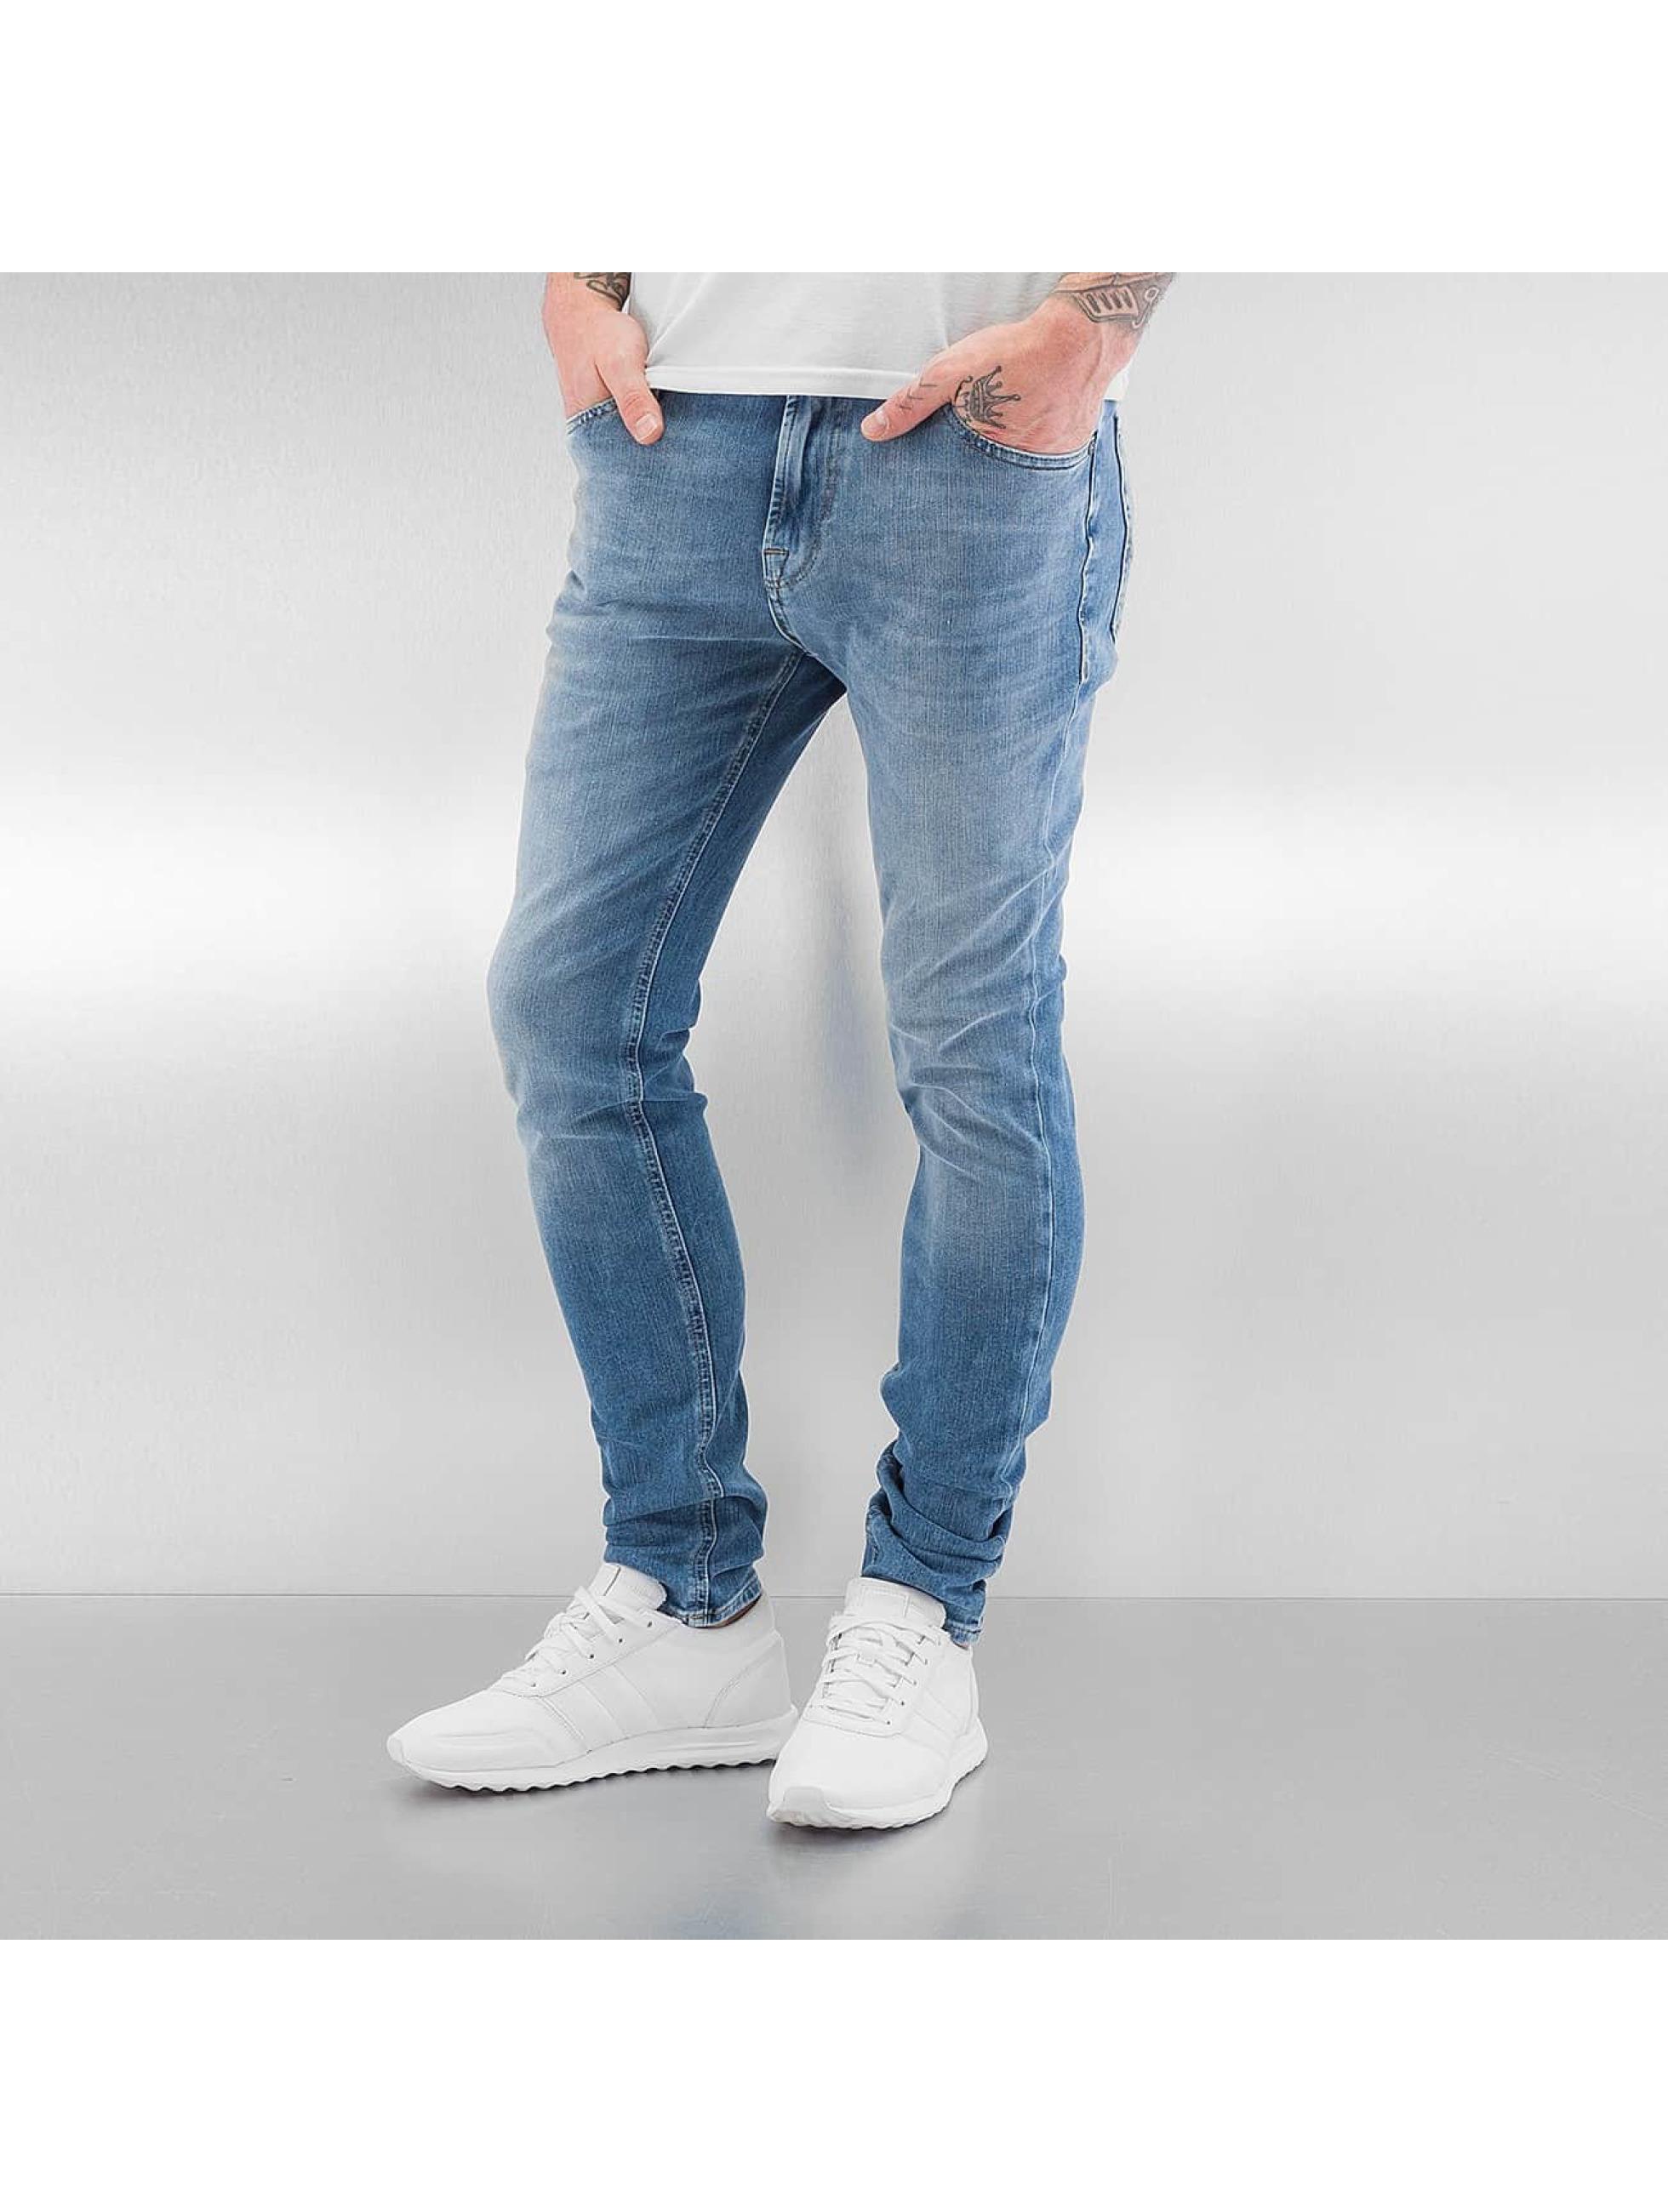 Jack & Jones Skinny Jeans jjiLiam jjOriginal in blau